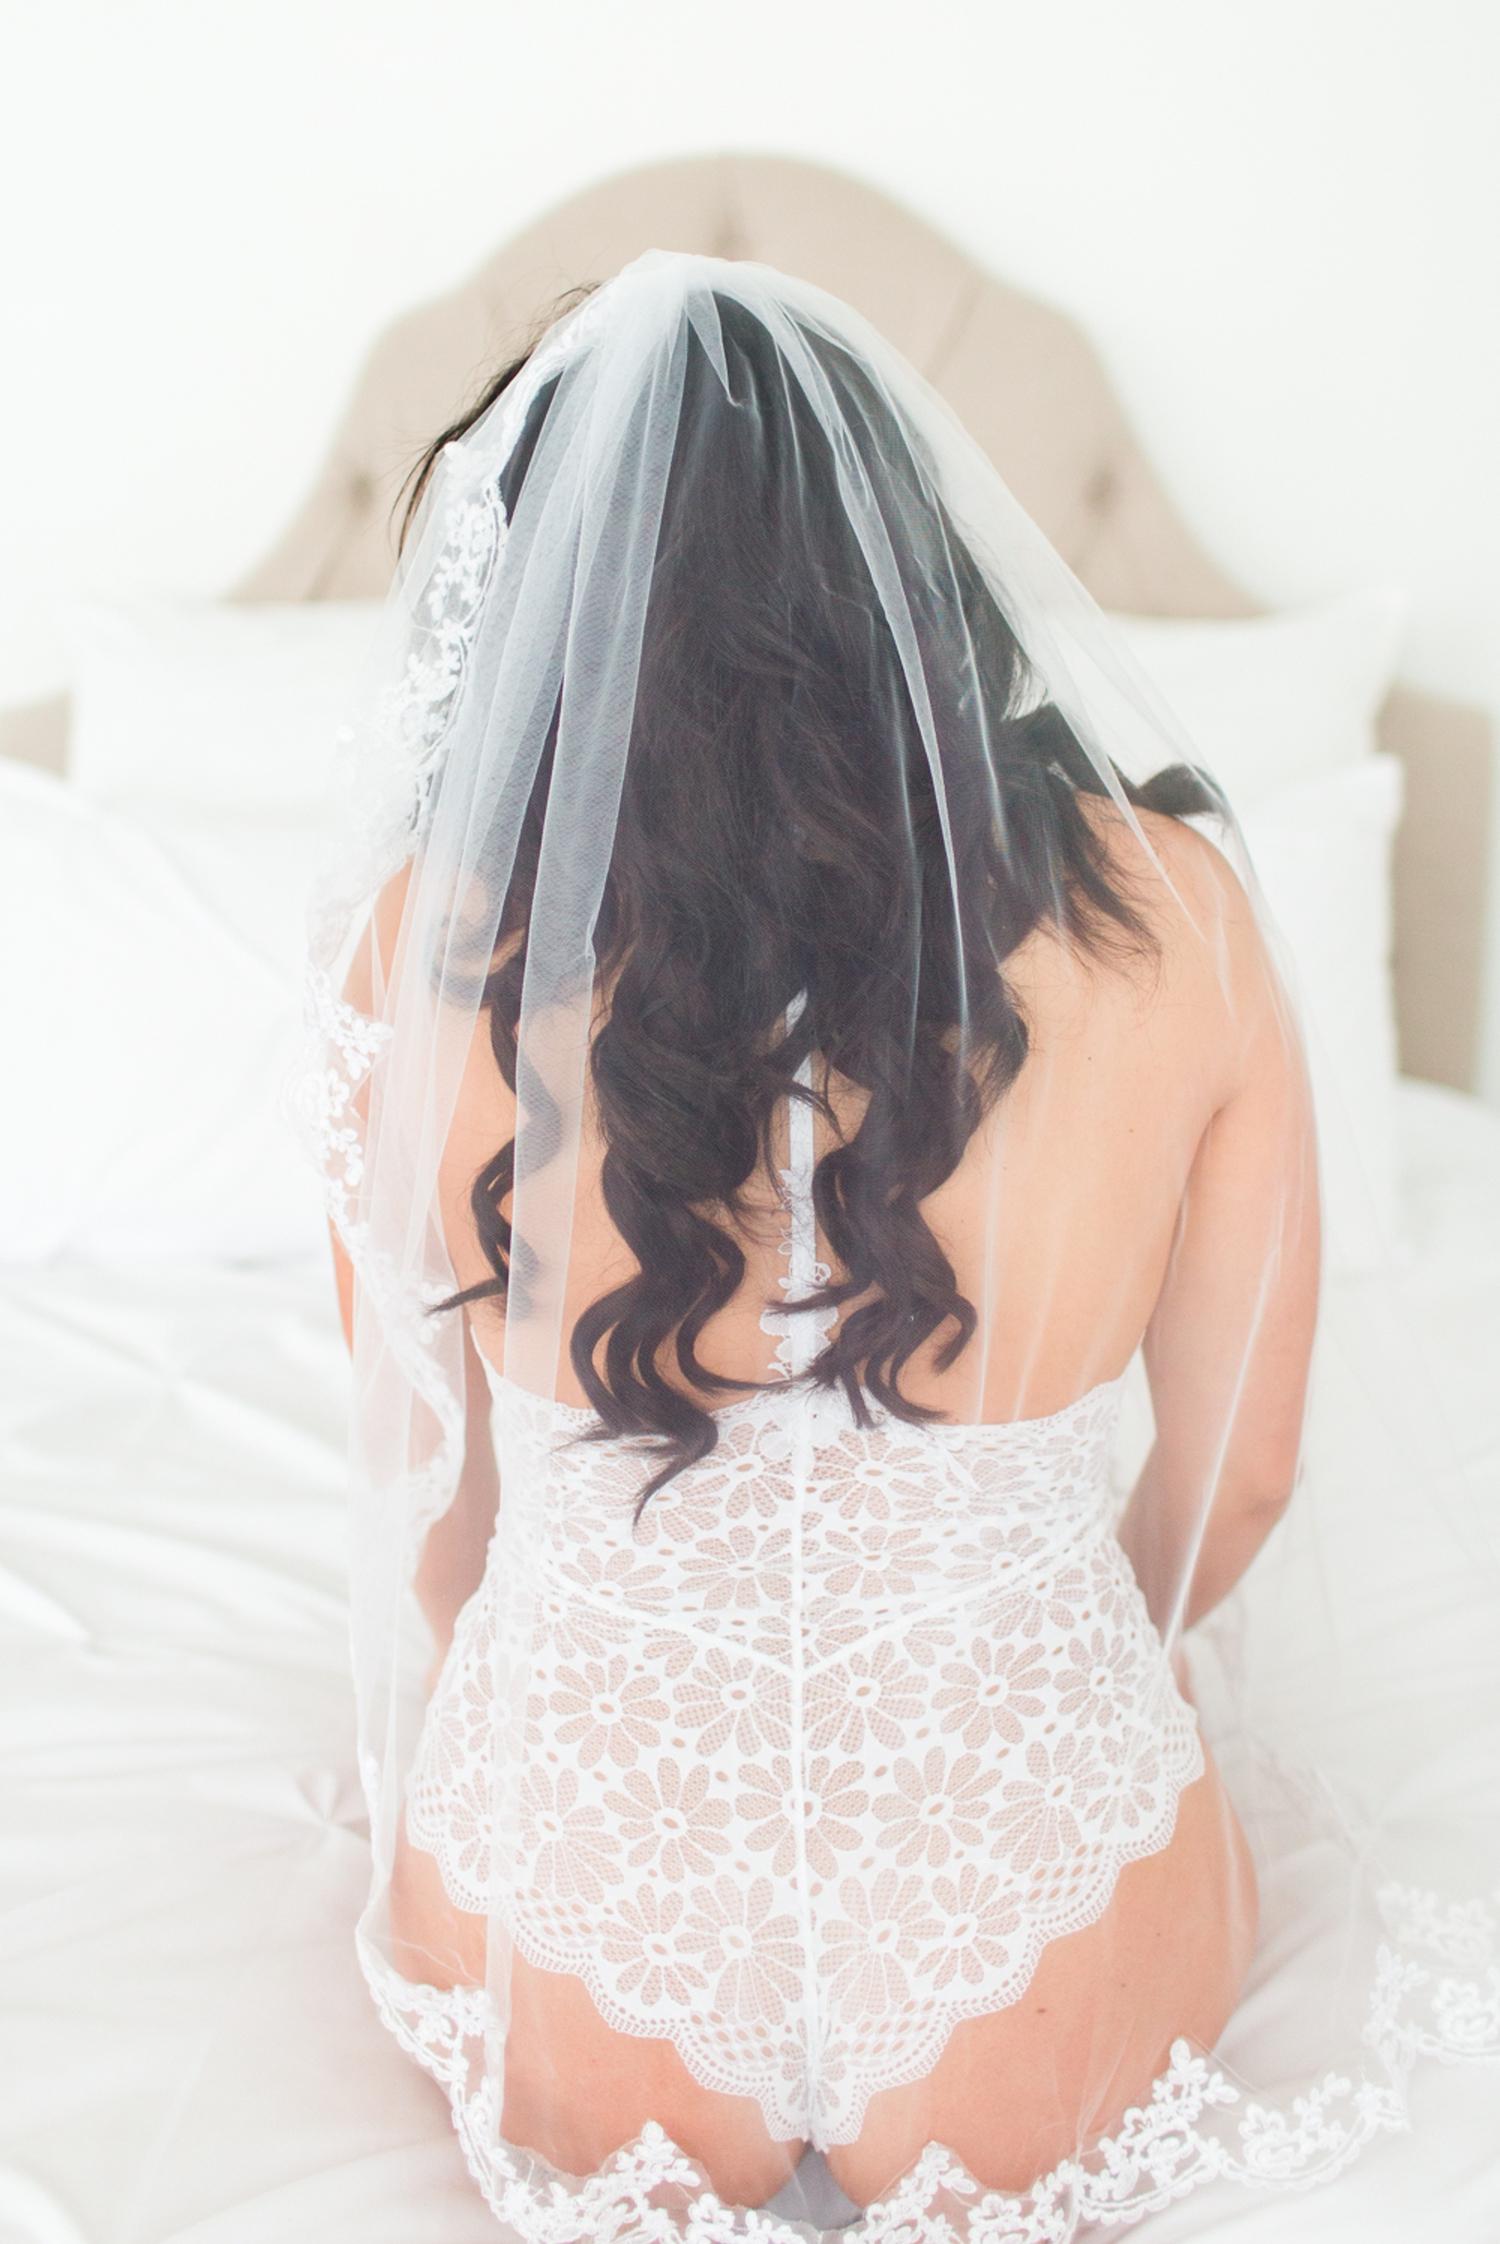 748a07645 top-connecticut-nyc-bridal-boudoir-photographer-studio-shaina-